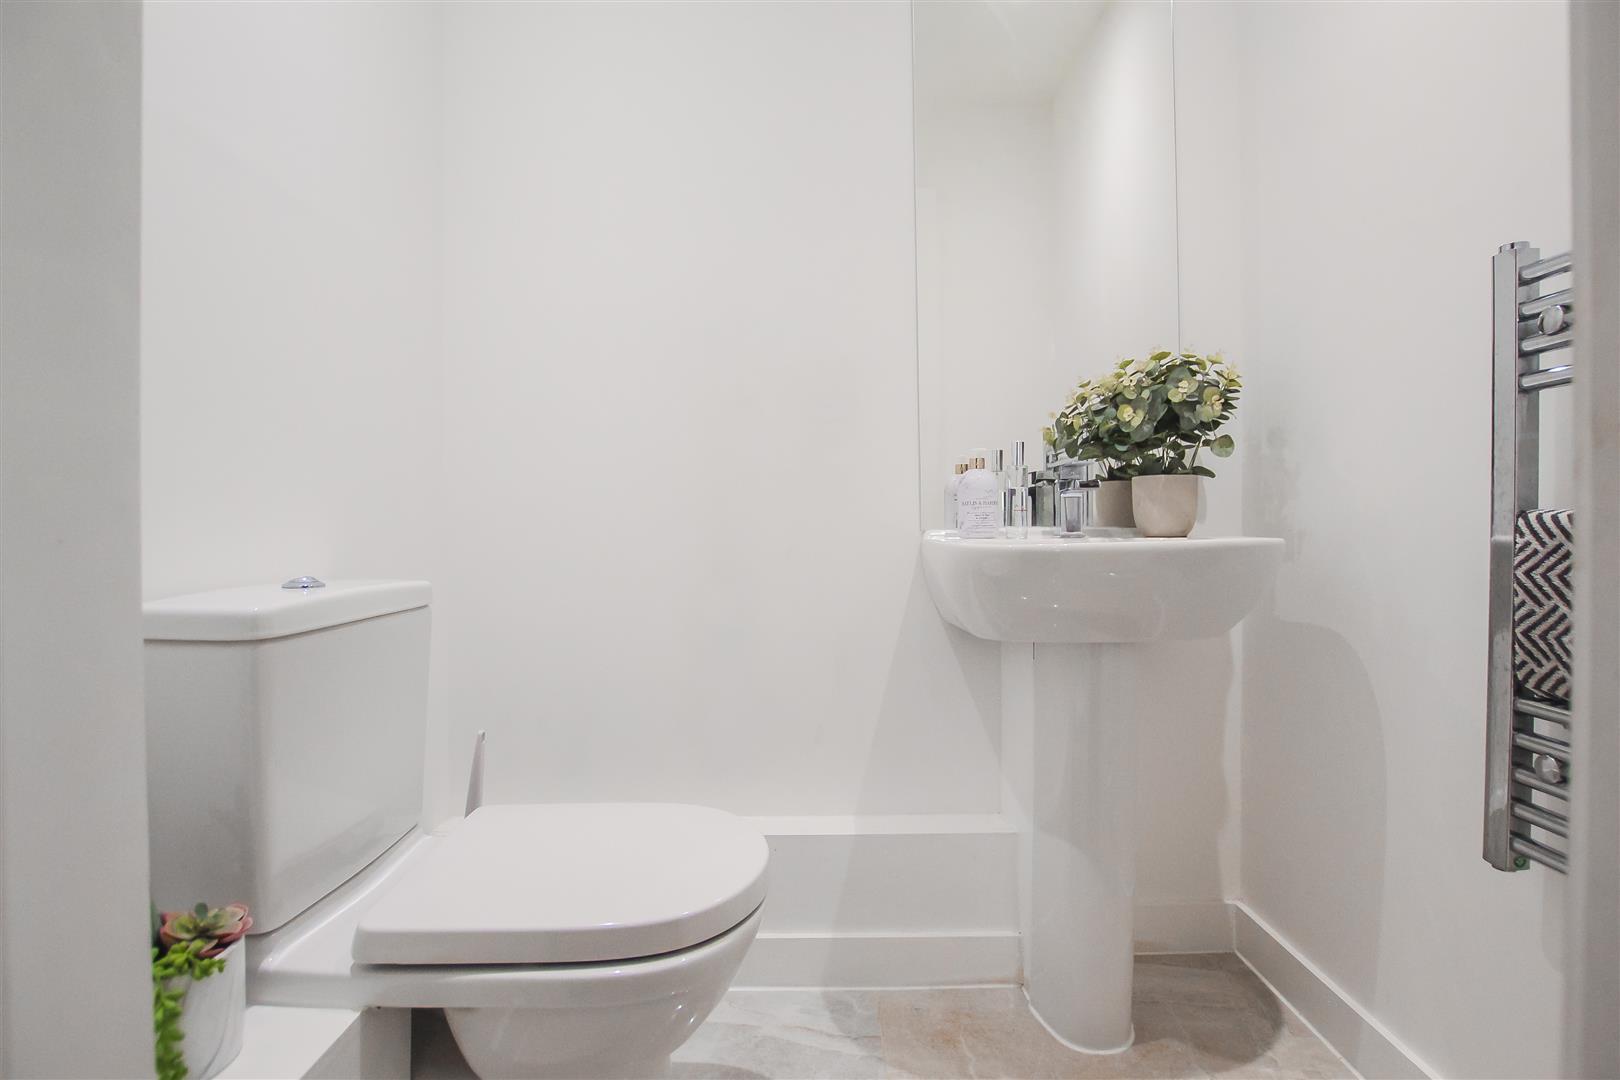 3 Bedroom Duplex Apartment For Sale - Image 17